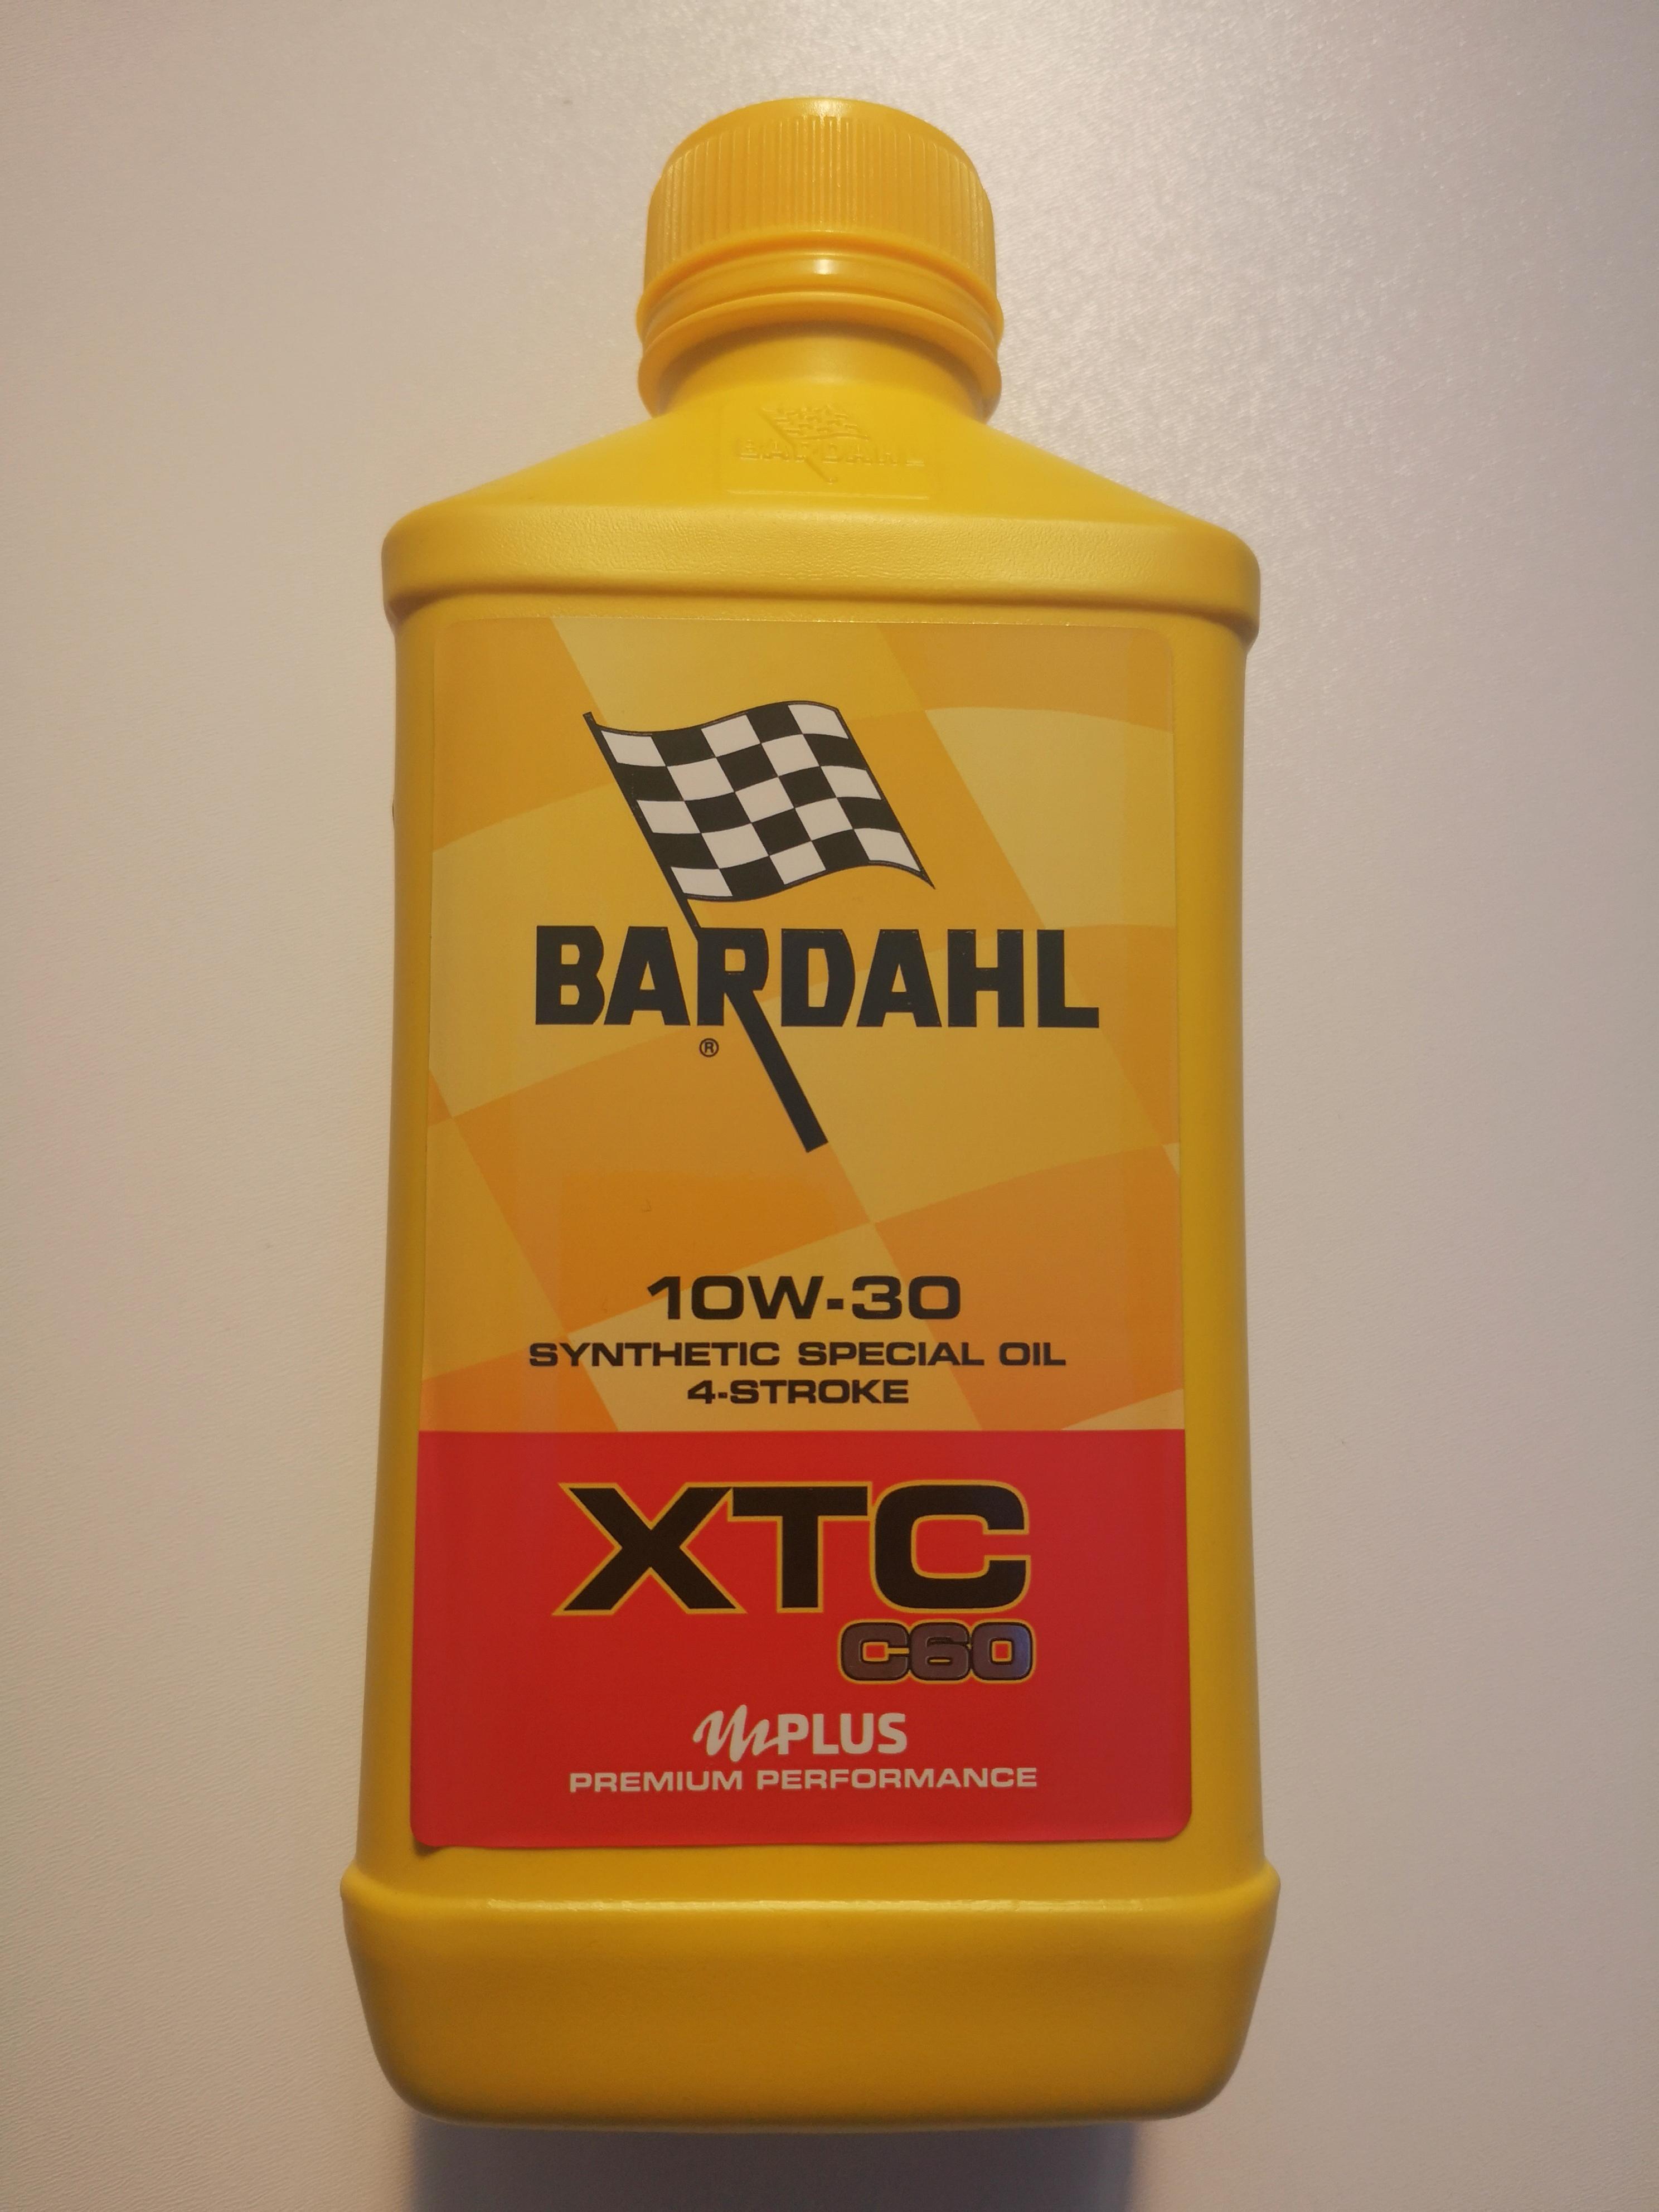 OLIO MOTORE BARDAHL XTC C60 per MOTO e SCCOTER 4 TEMPI BASE SINTETICA SAE10W30